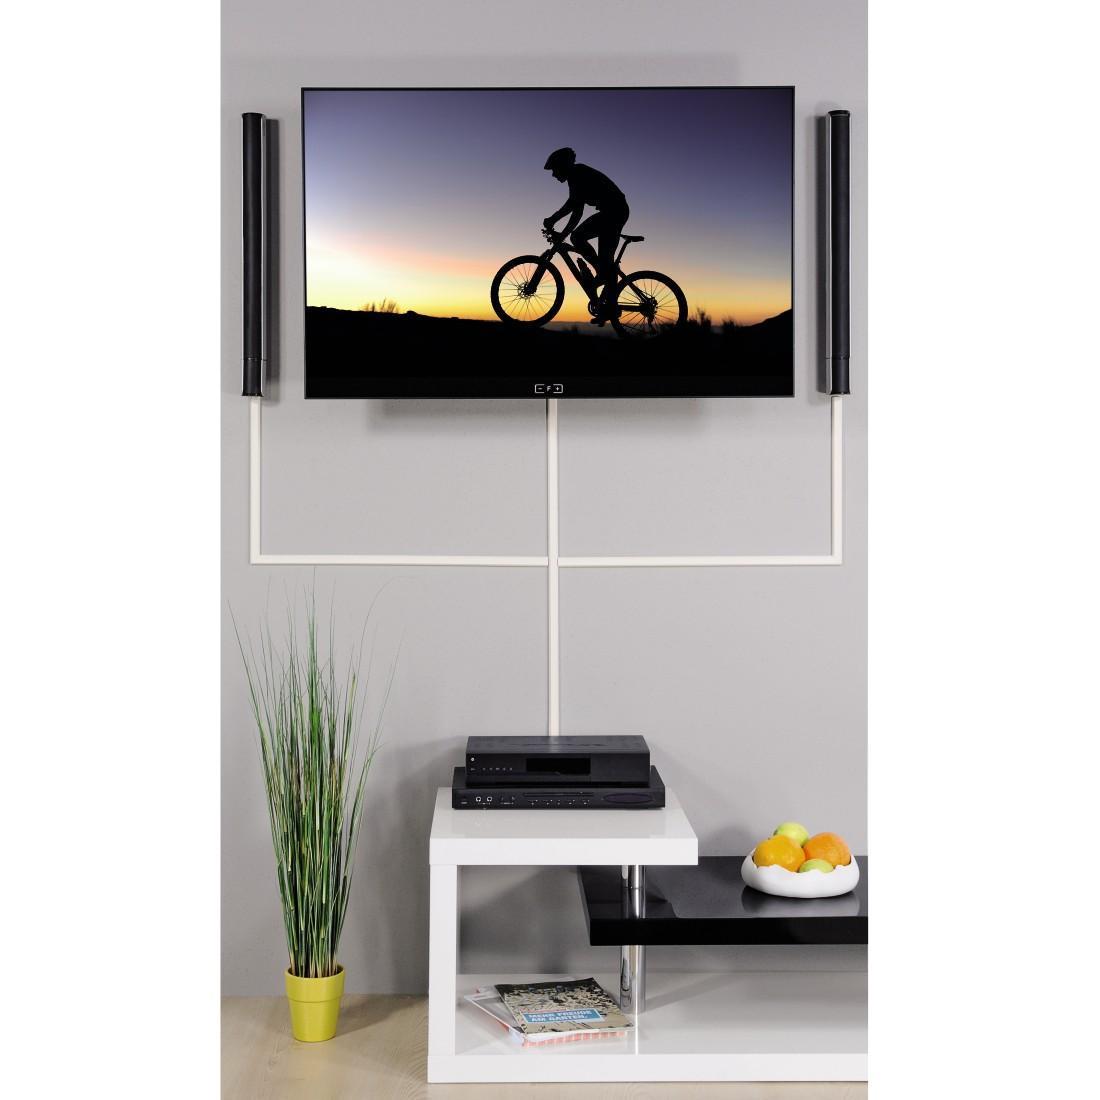 Hama kabelkanal pvc weiß: amazon.de: elektronik